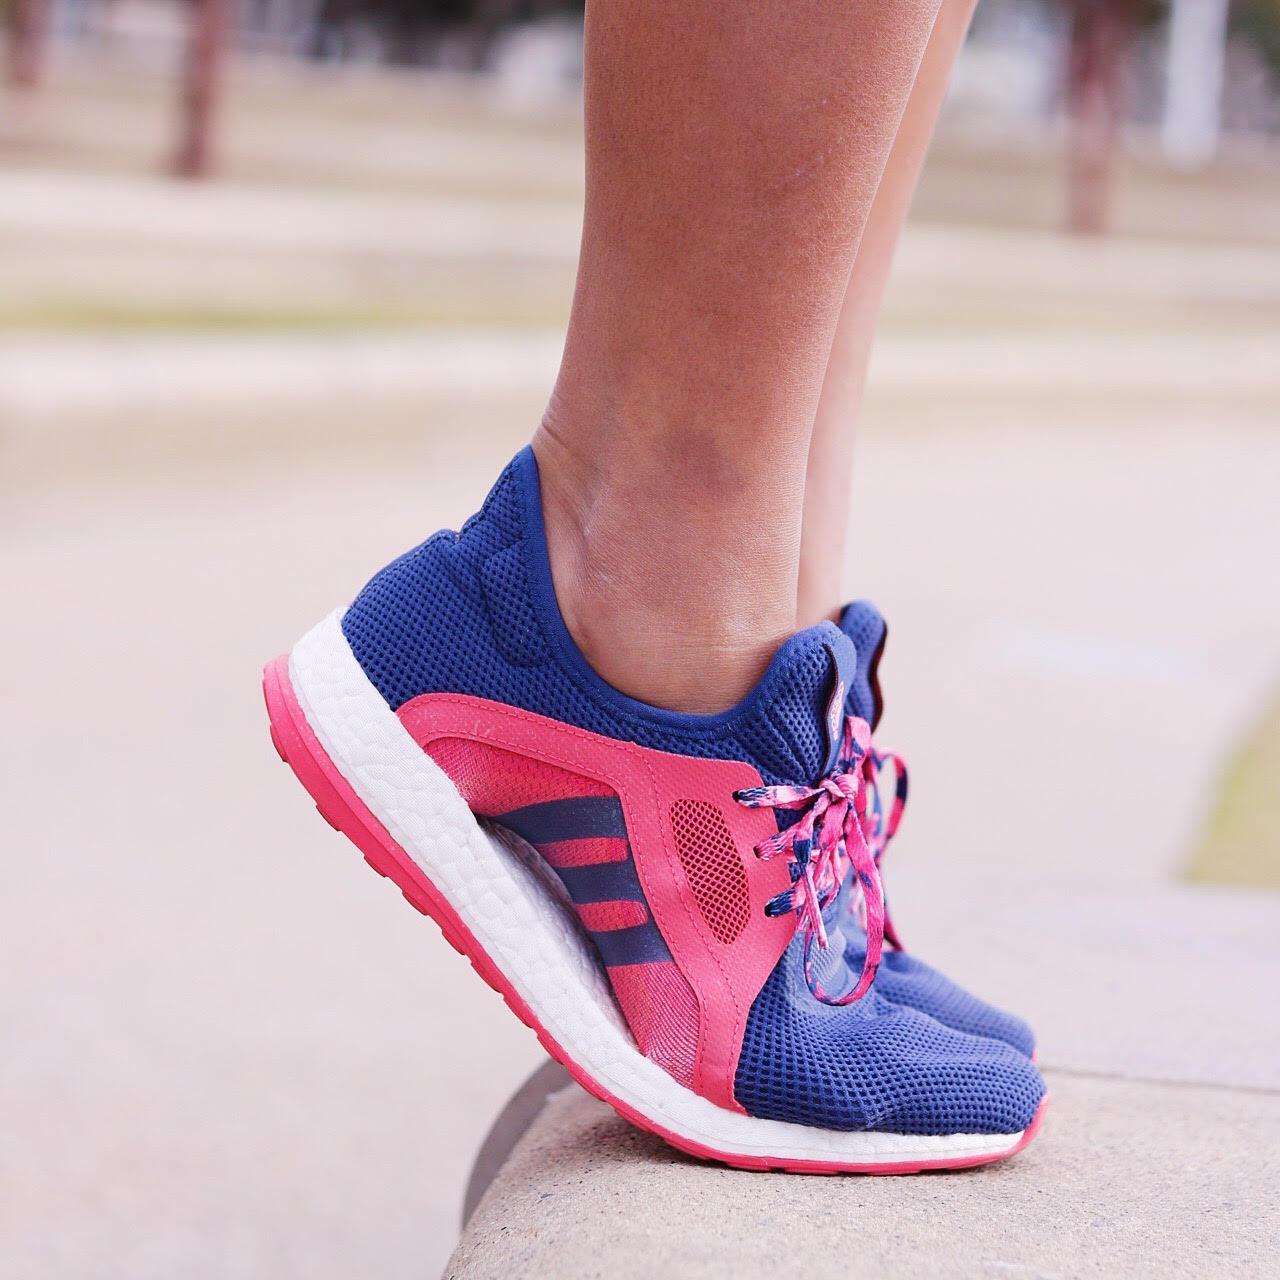 Adidas Pure Boost X 5